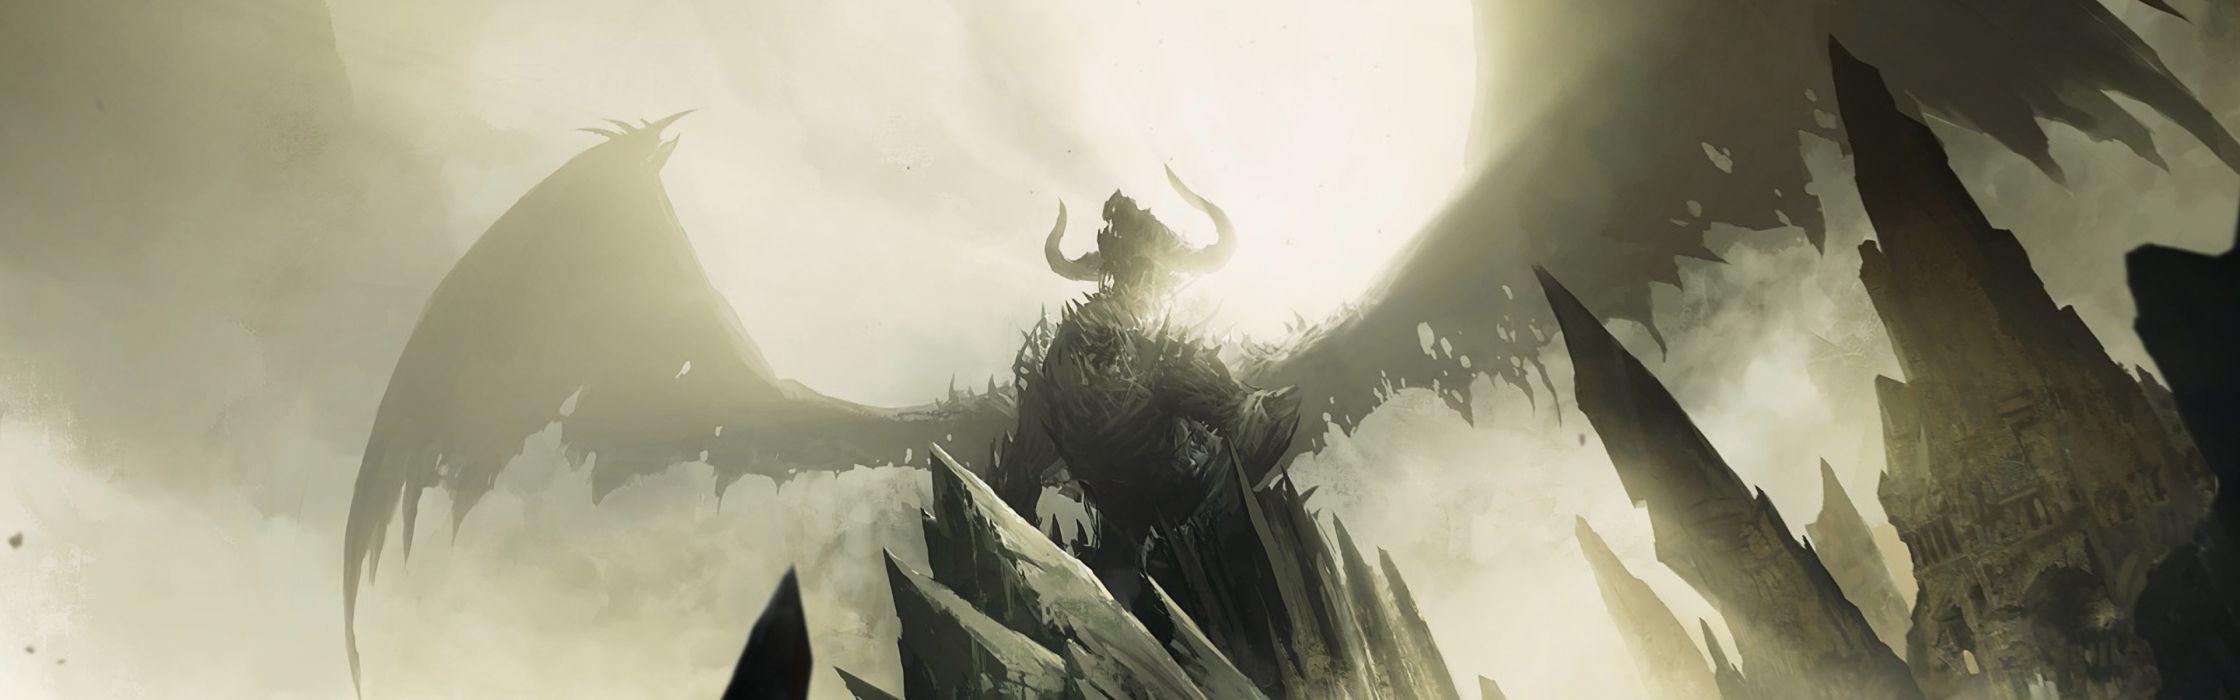 Dragons guild wars 2 wallpaper